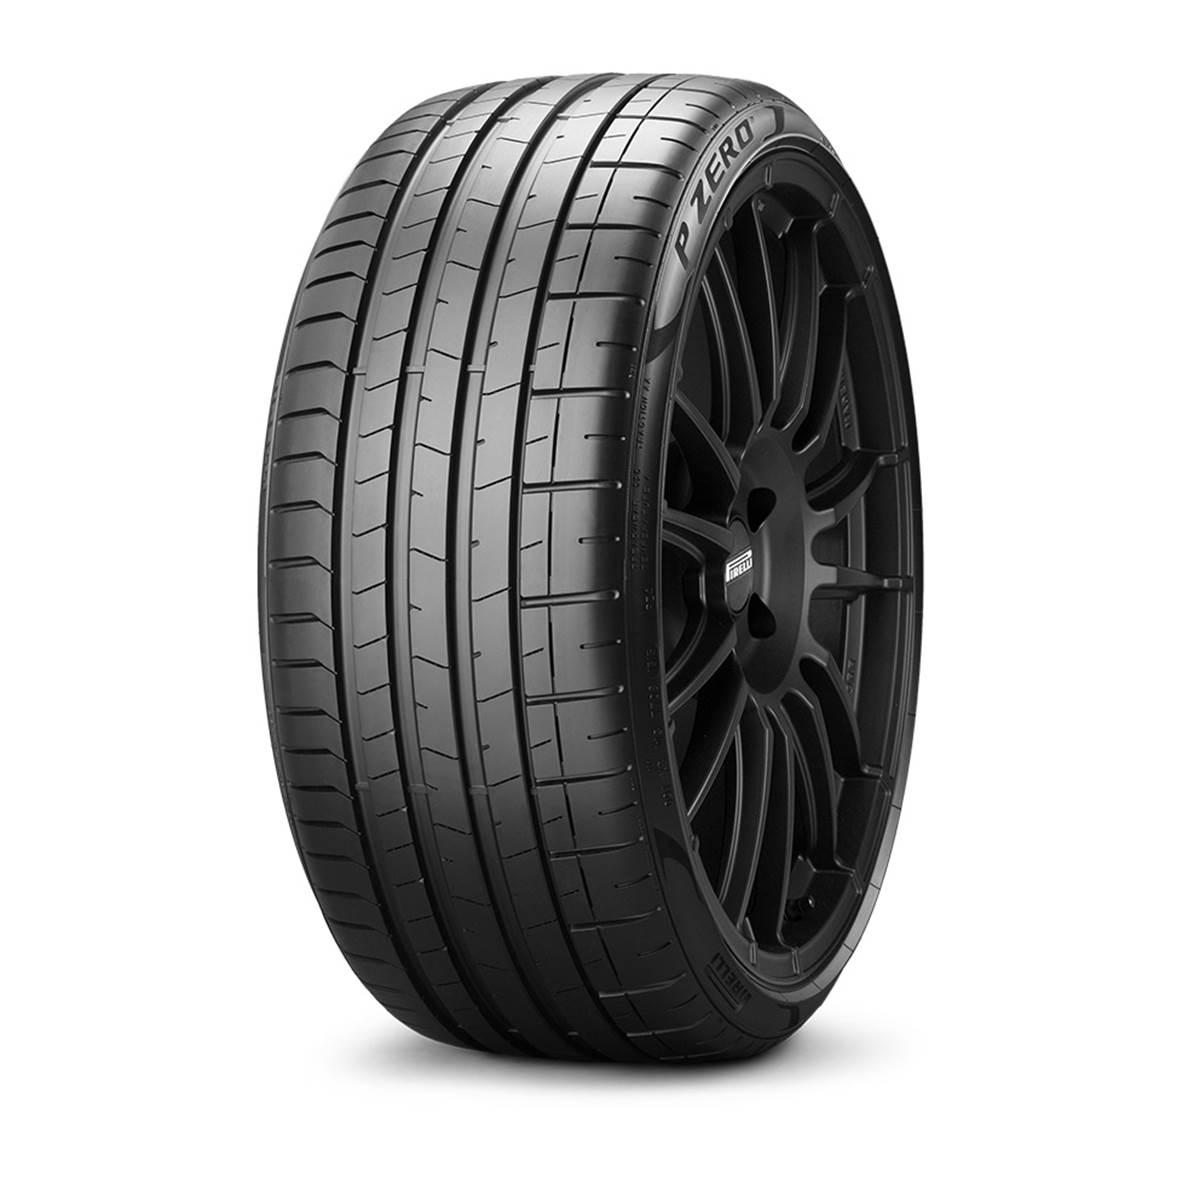 Pneu Pirelli 245/45R18 100W P-Zero XL